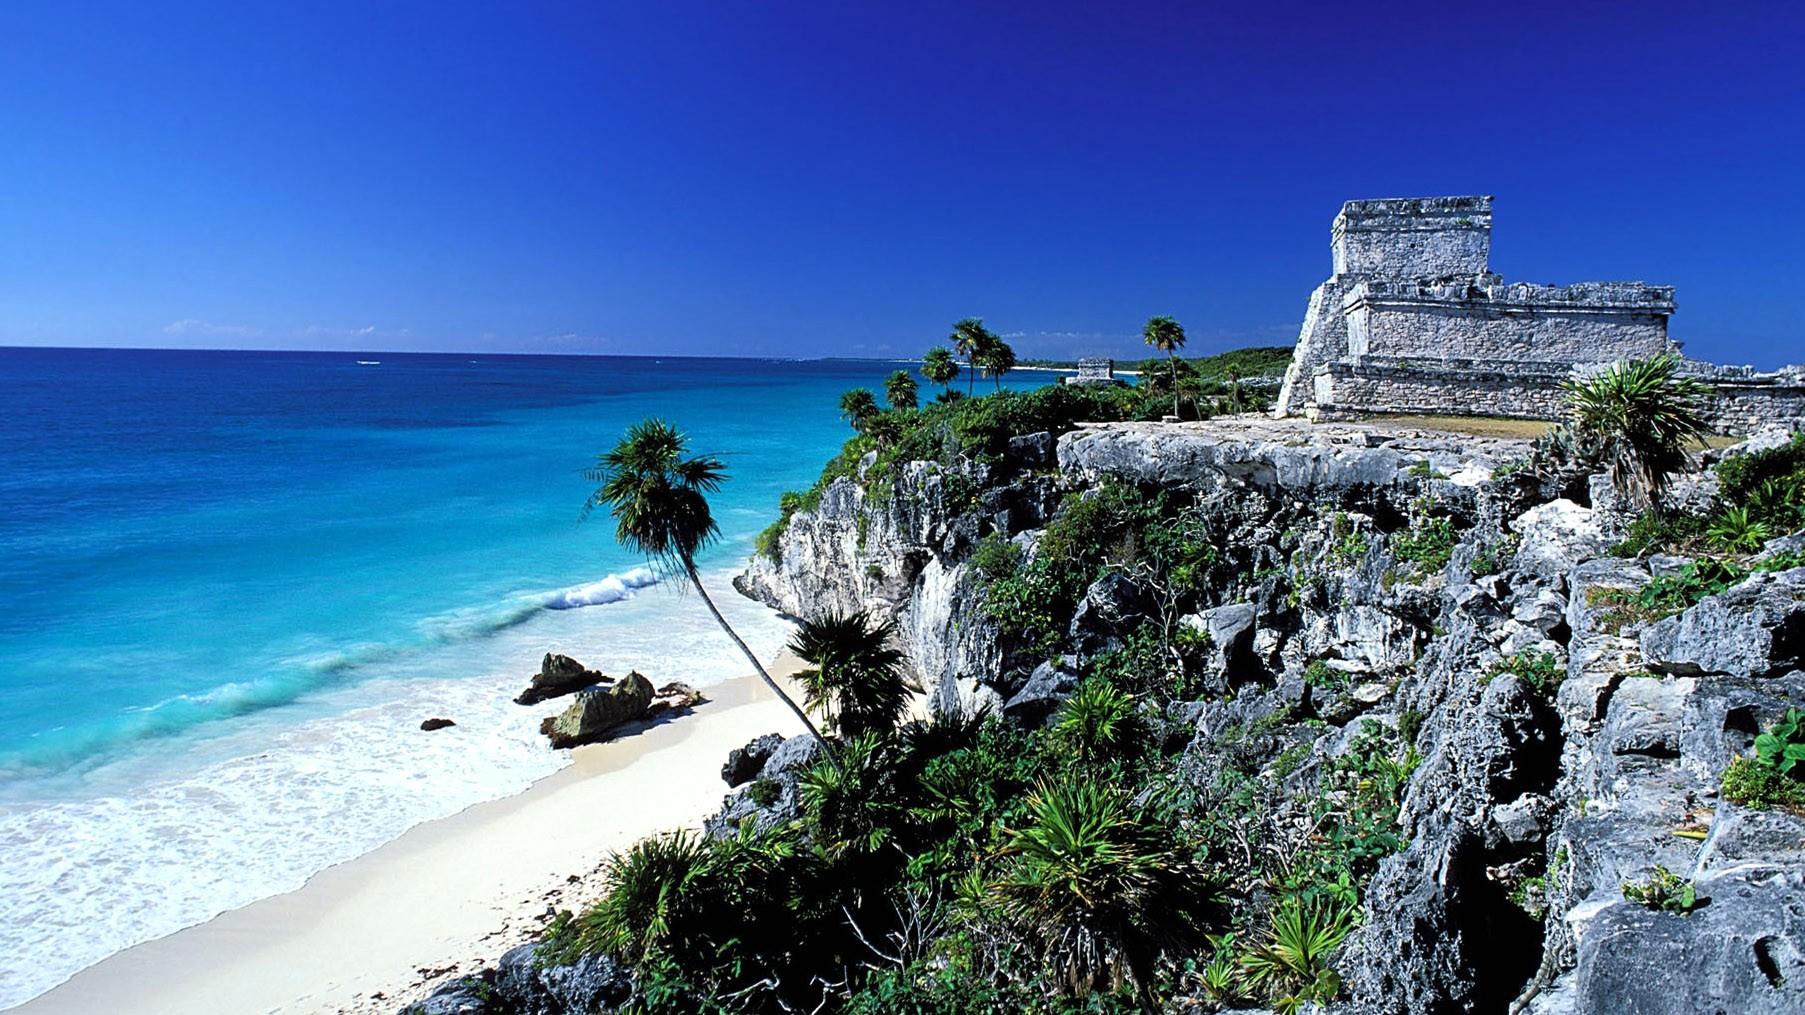 Tulum Mexico Summer HD Sea Wallpapers Ocean Summer Sun Sky 1805x1015